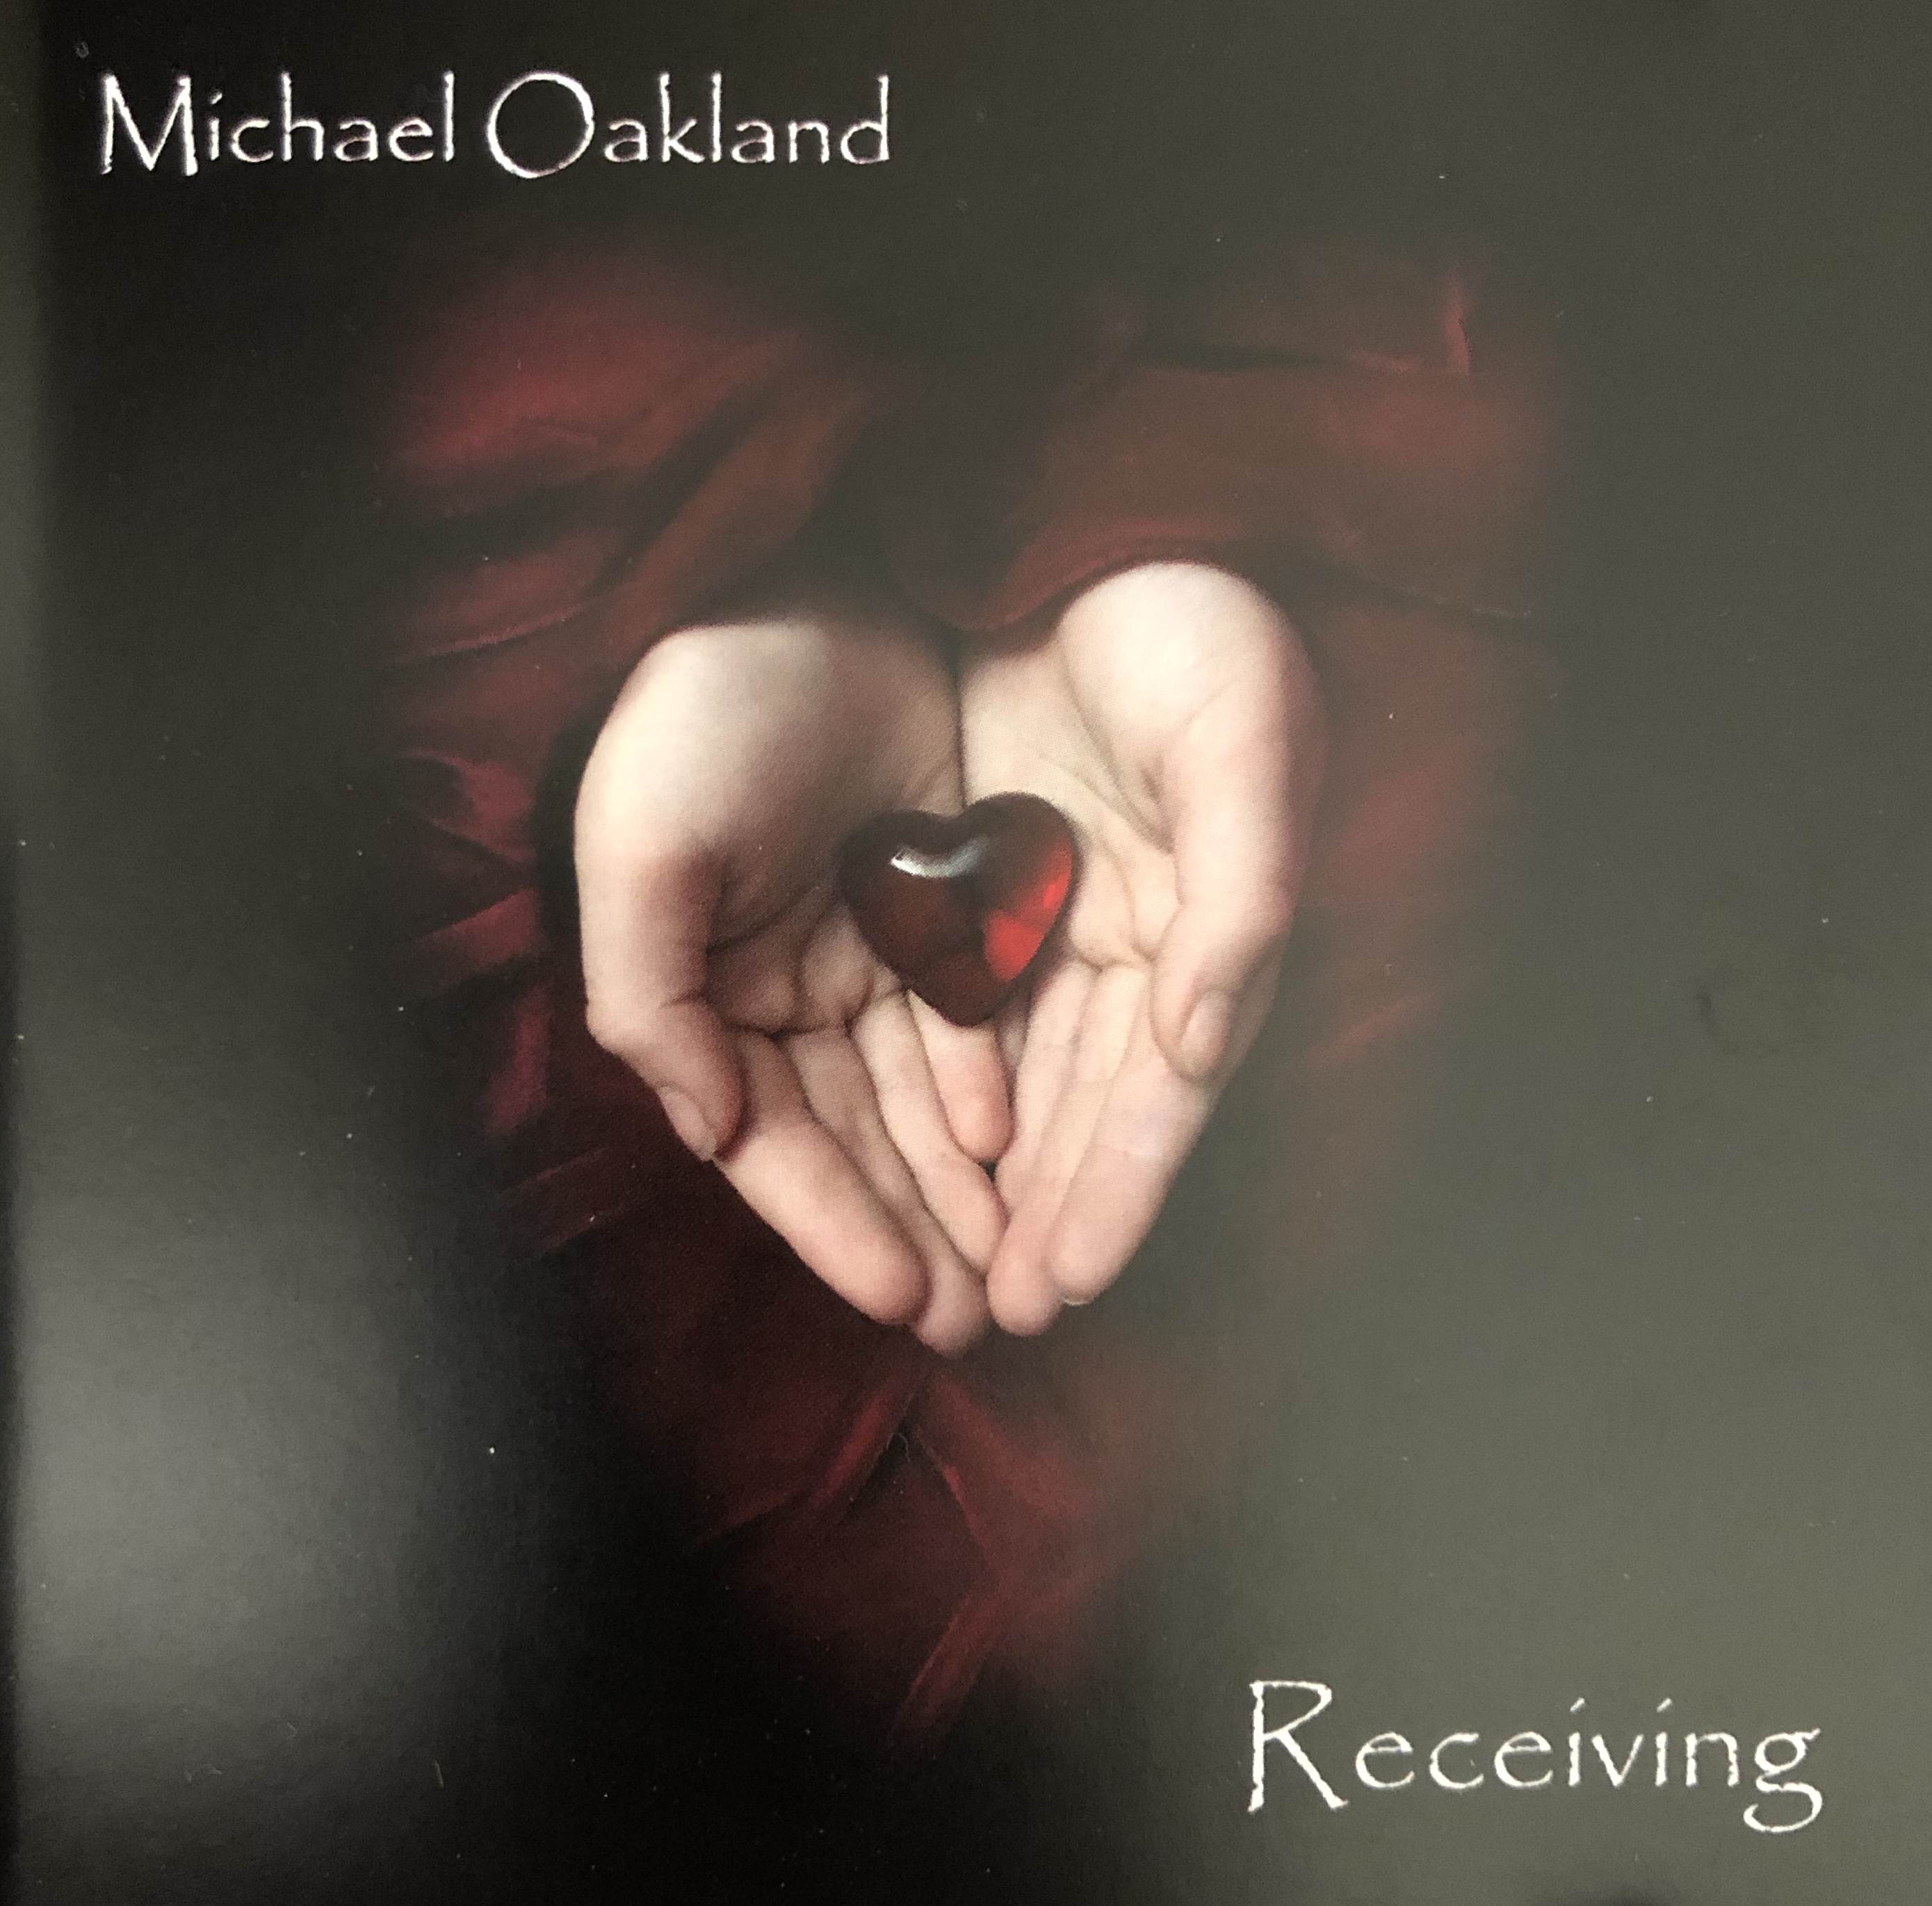 Michael Oakland: Receiving